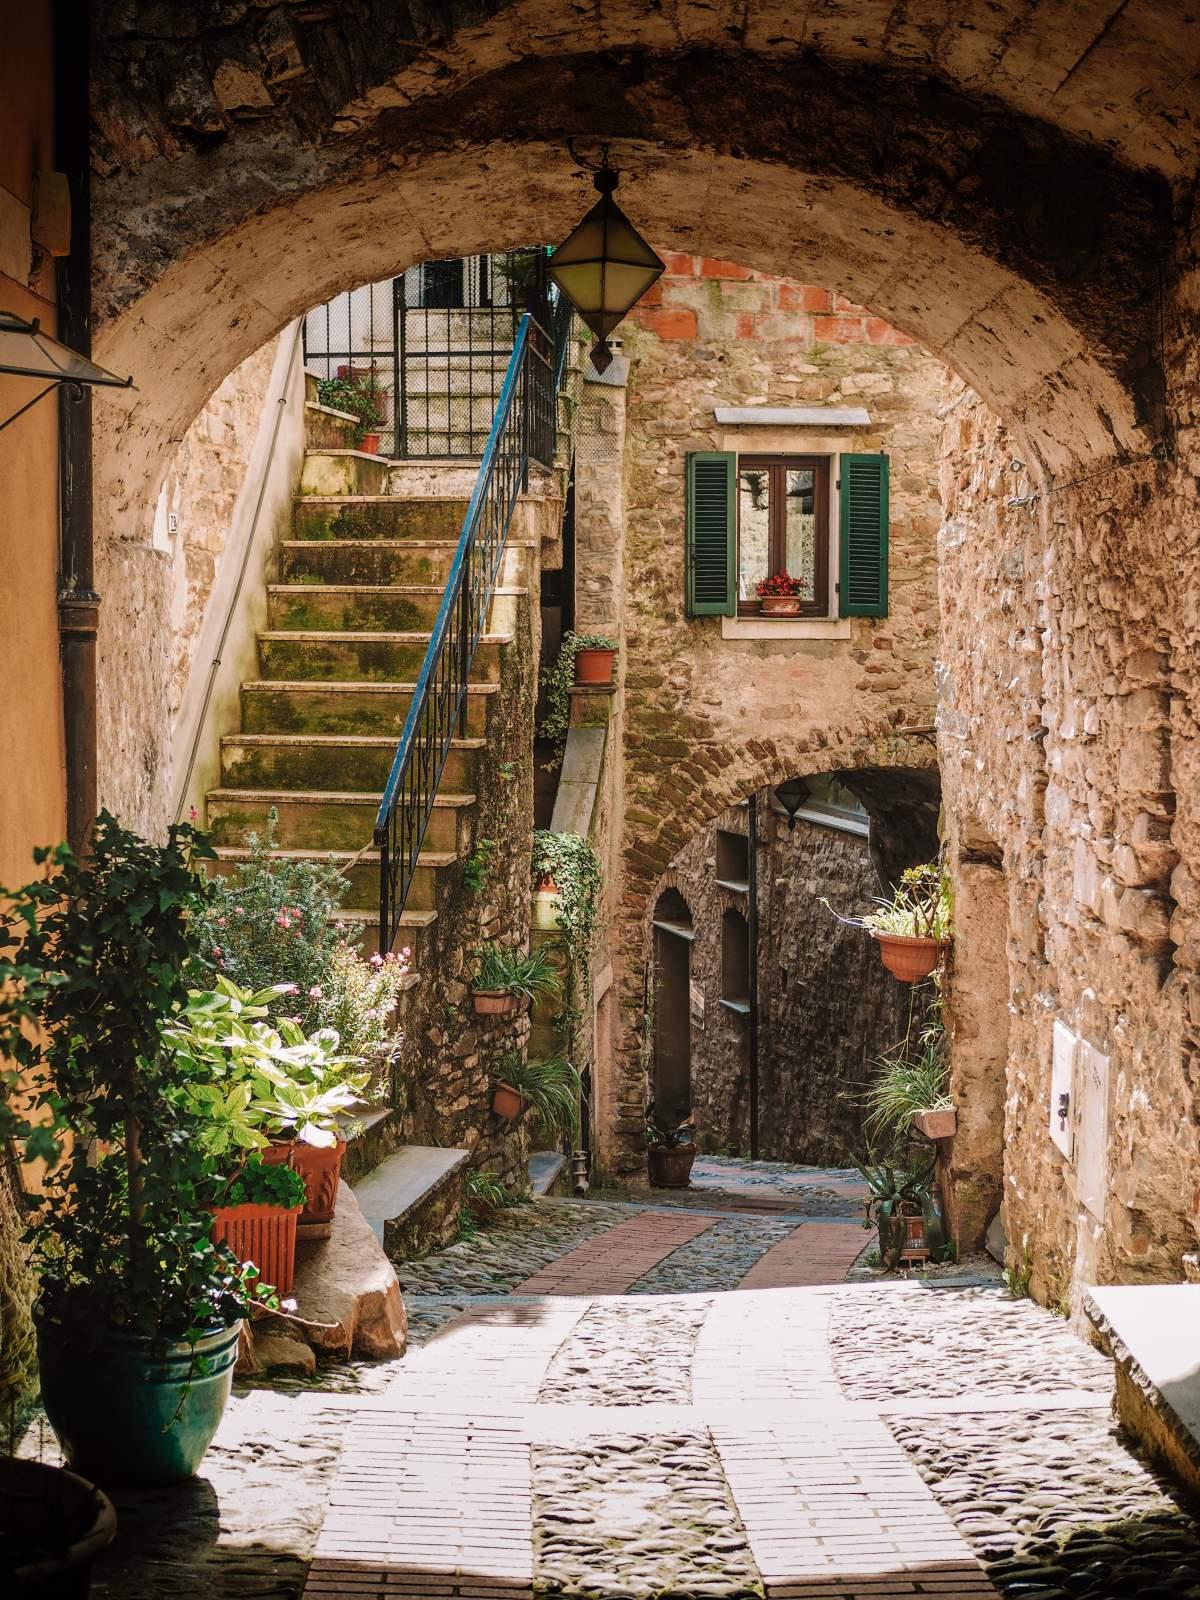 Dolceacqua μεσαιωνικό χωριό, δυτική Λιγουρία